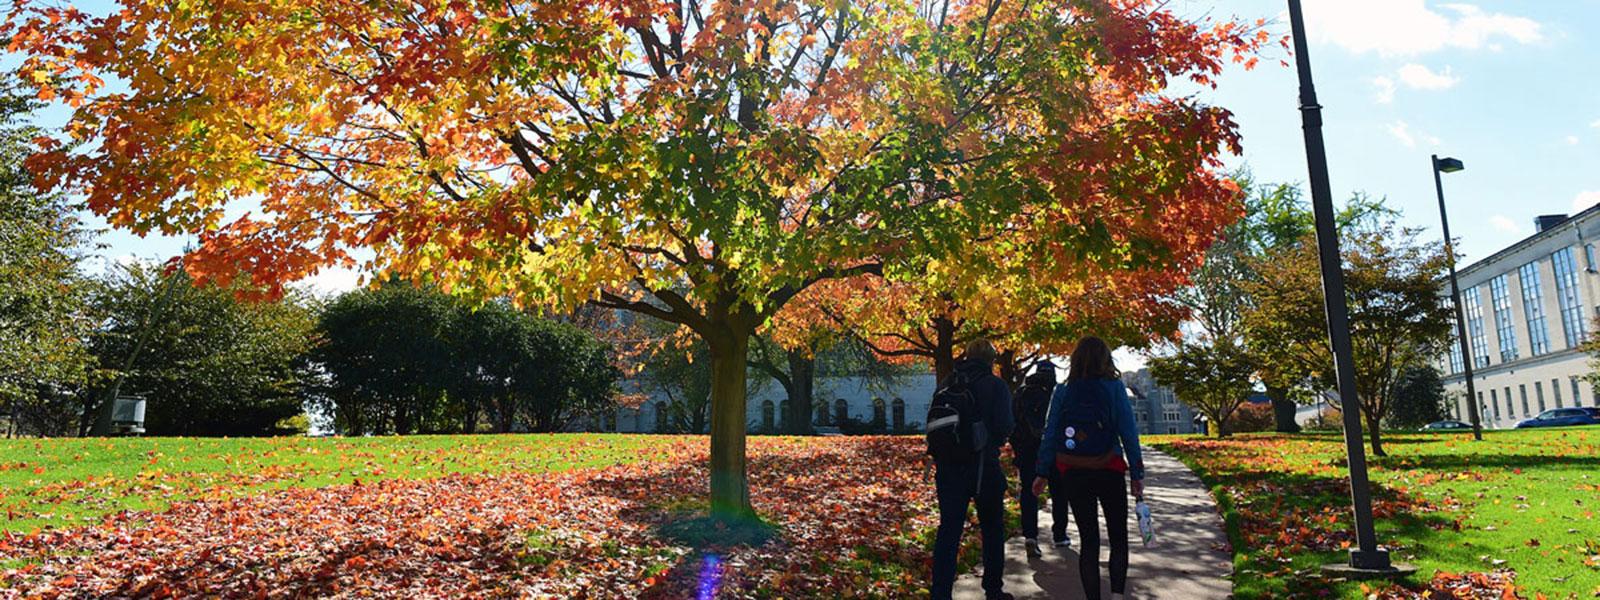 Students walking through leaves